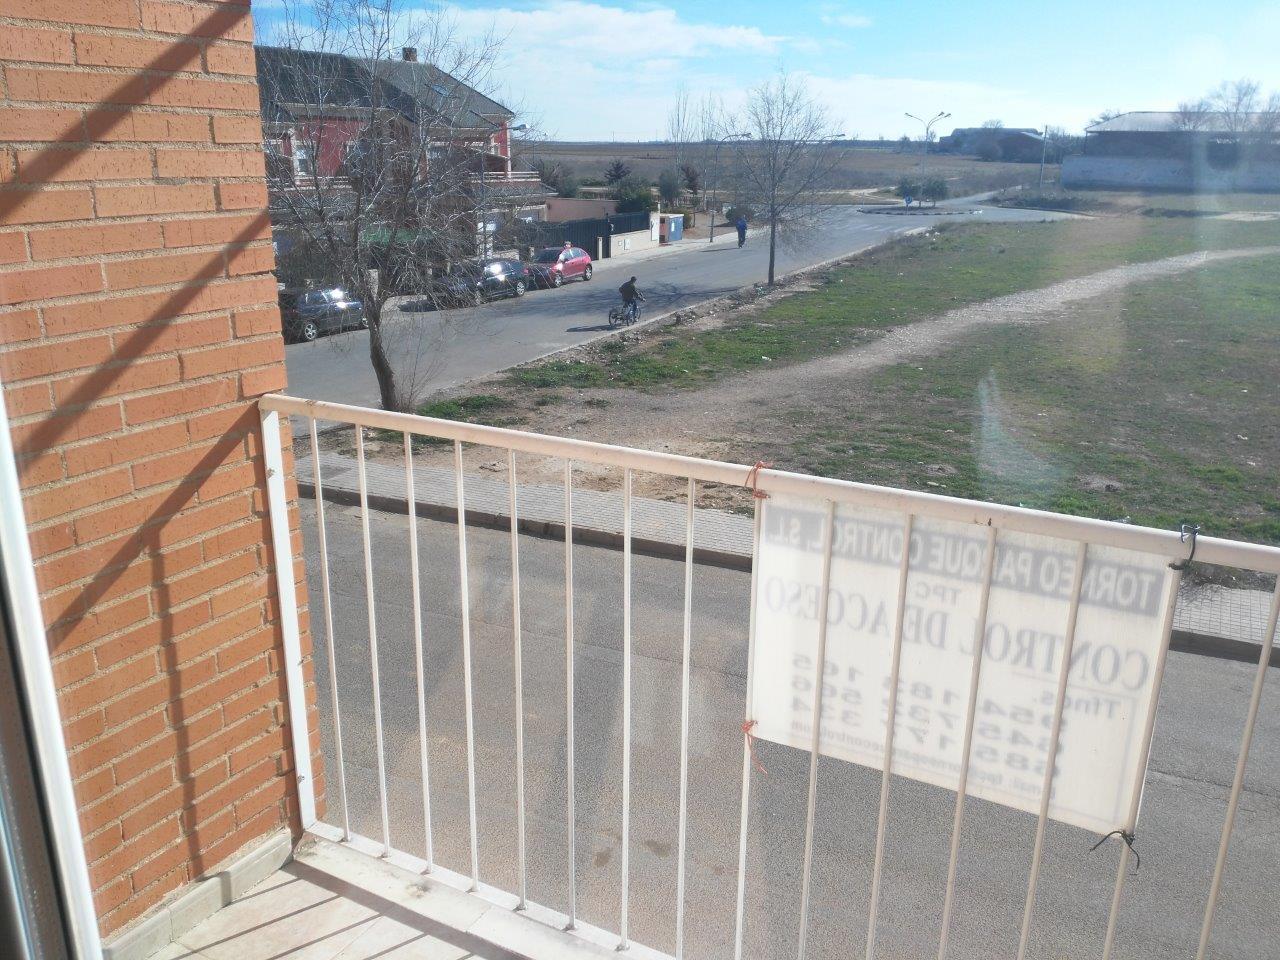 Pisos a estrenar en Ocaña, cerca de Madrid